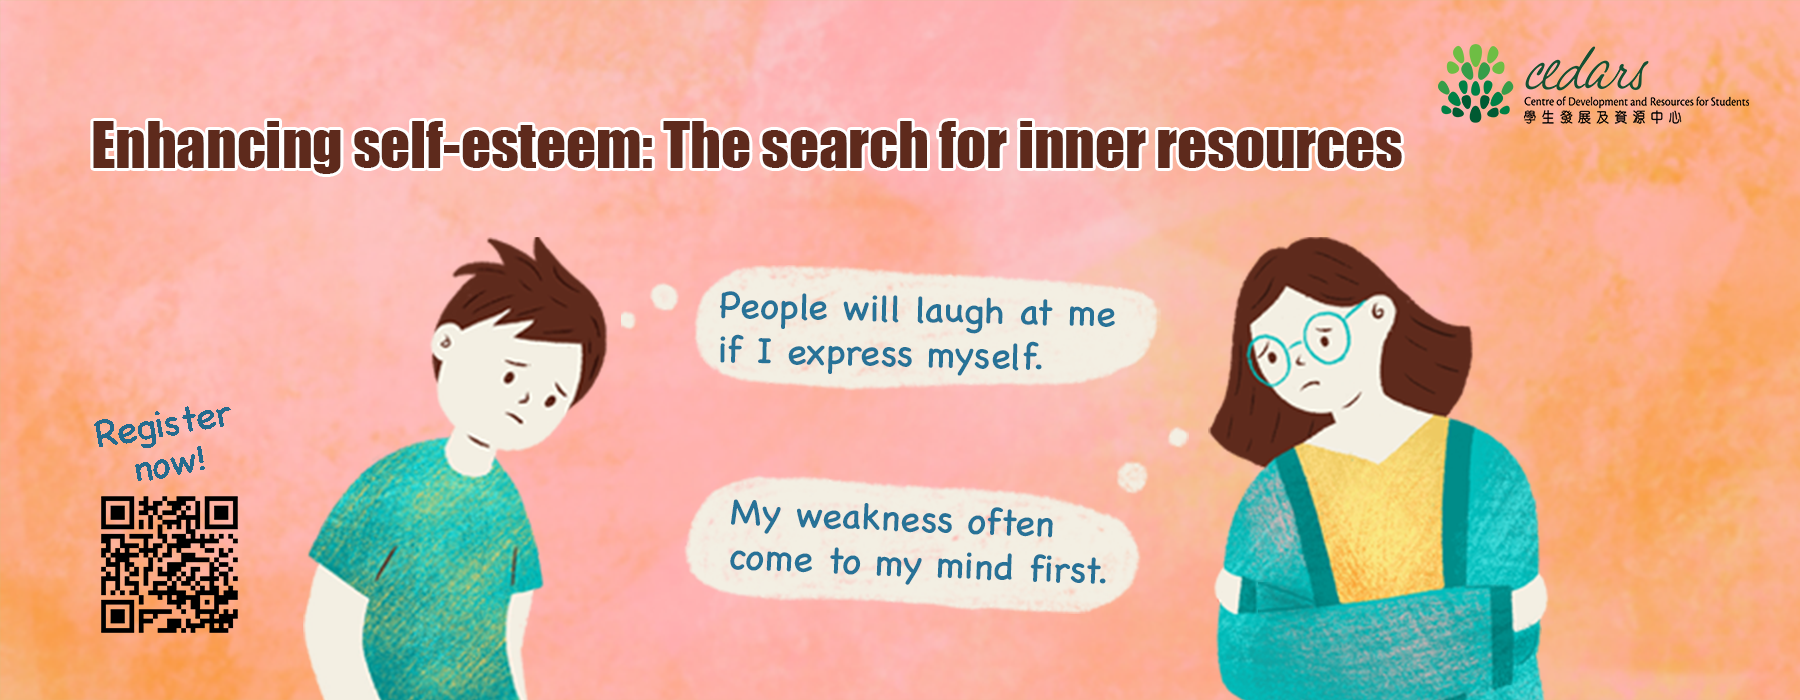 Self-esteem Workshop